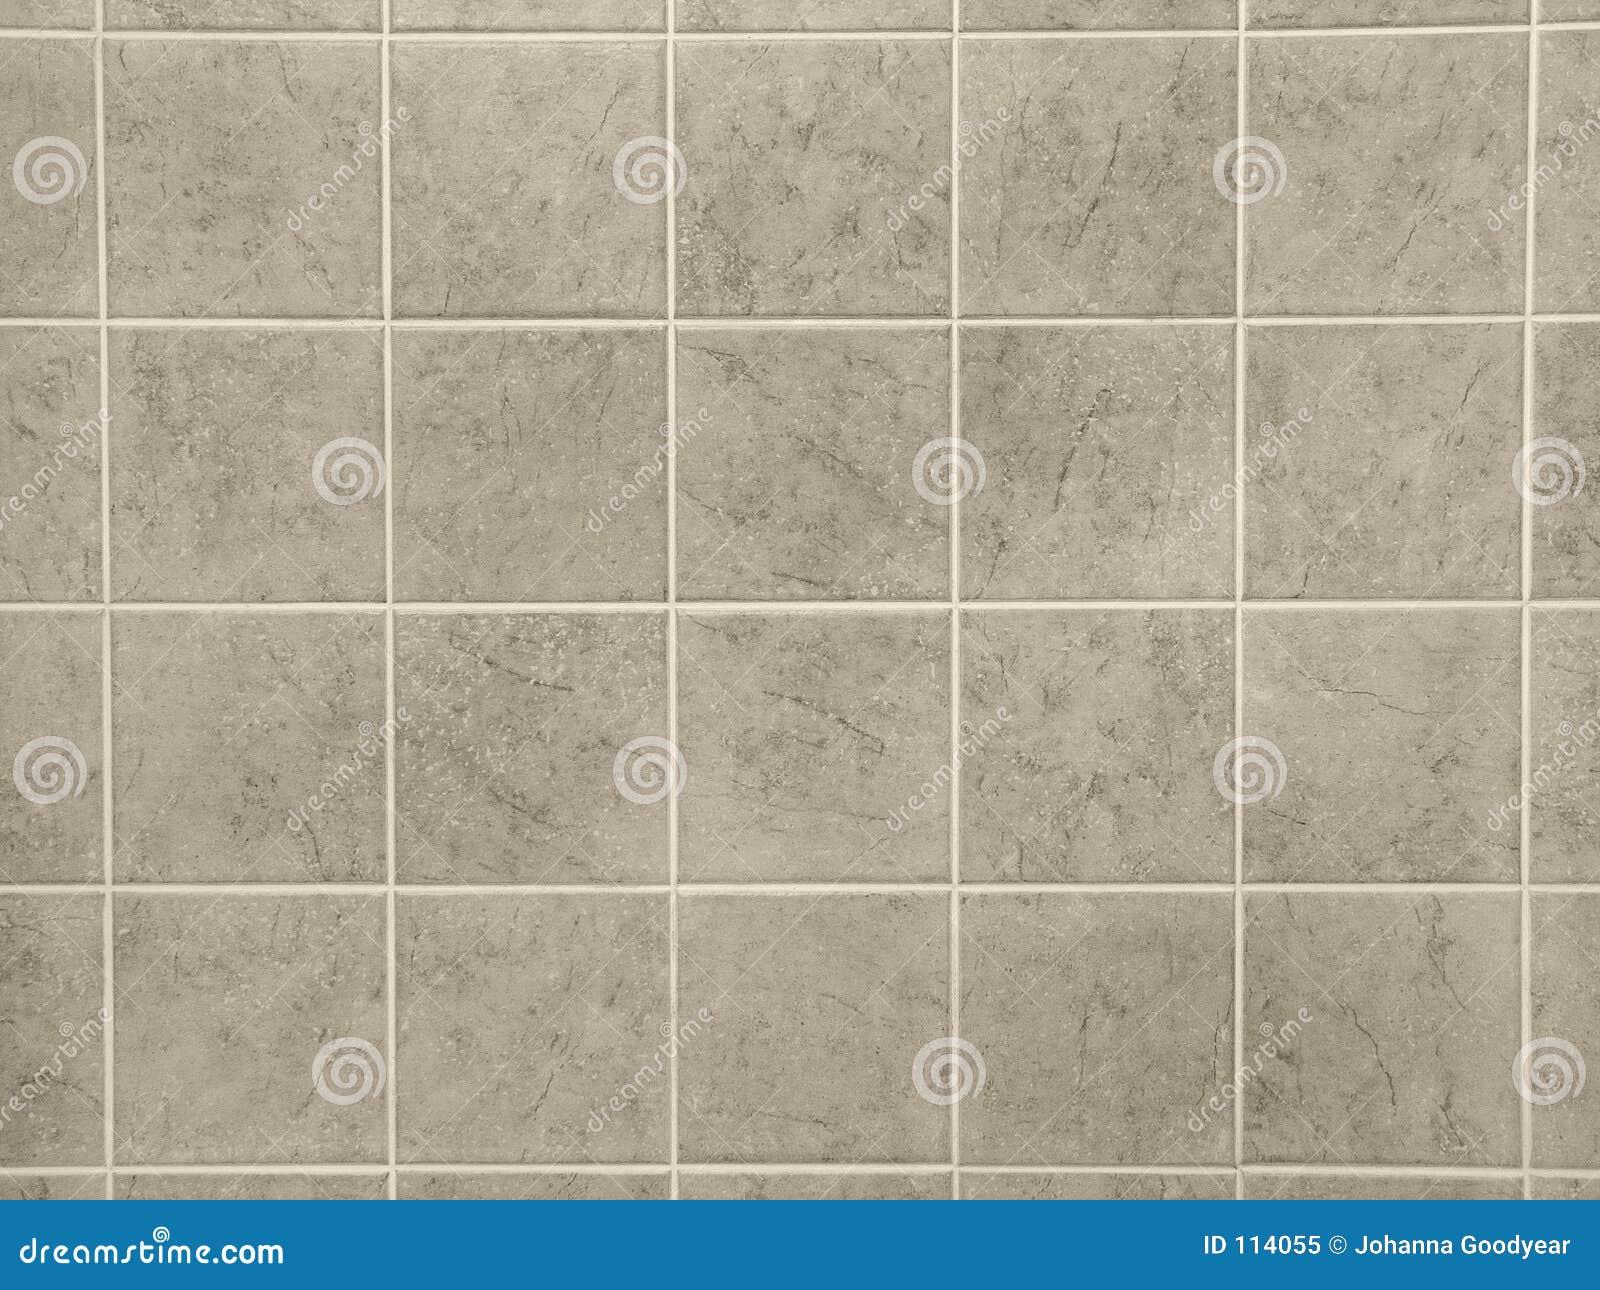 Beige Tiles Royalty Free Stock Photo Image 114055